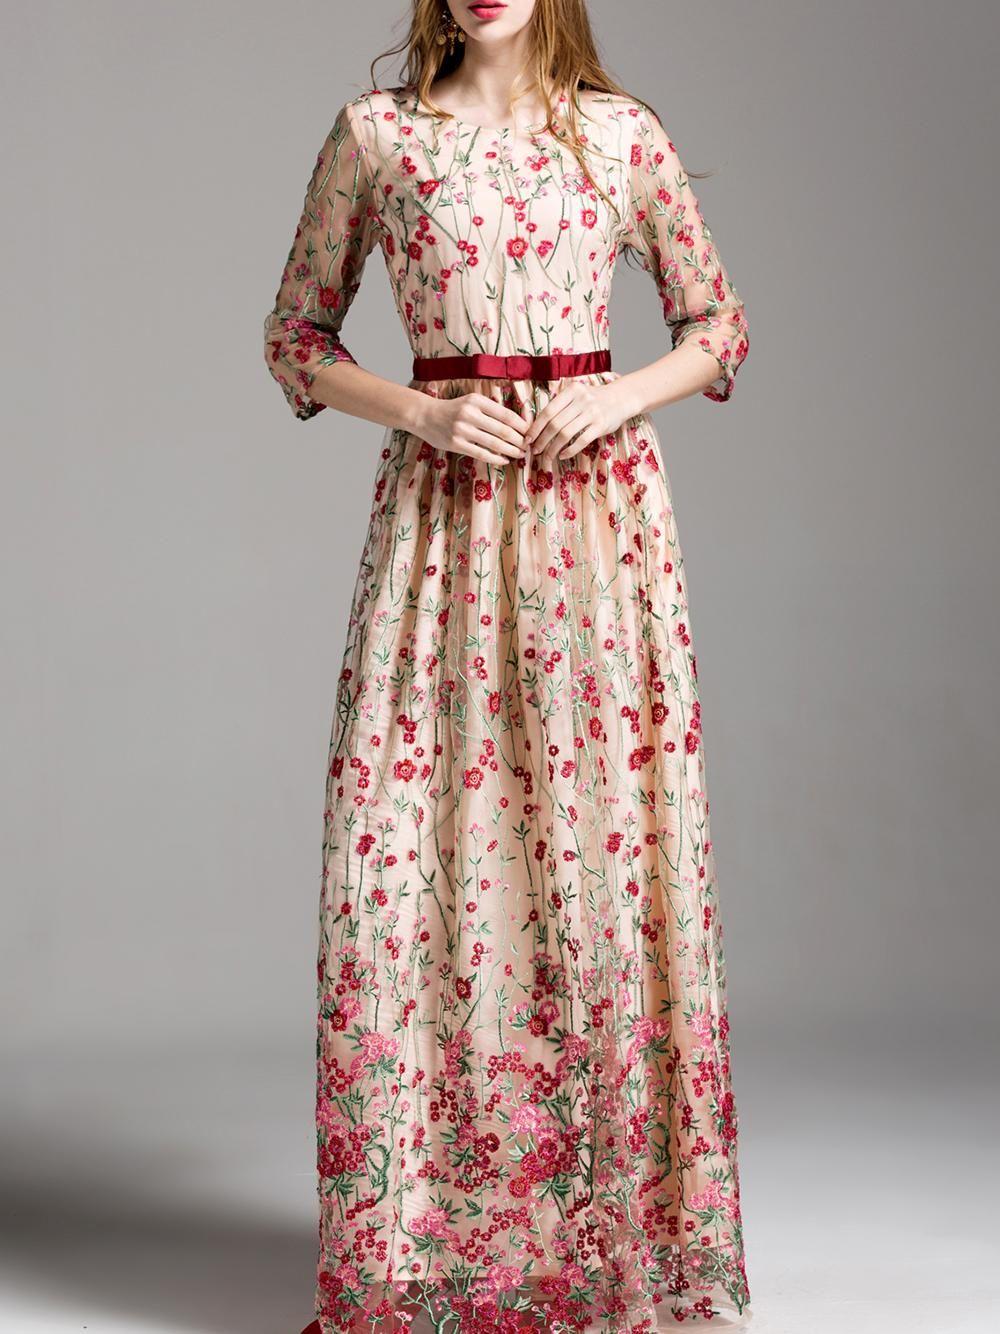 0a2a513bd7 SheIn - SheIn Flowers Embroidered Maxi Dress - AdoreWe.com | lehenga ...